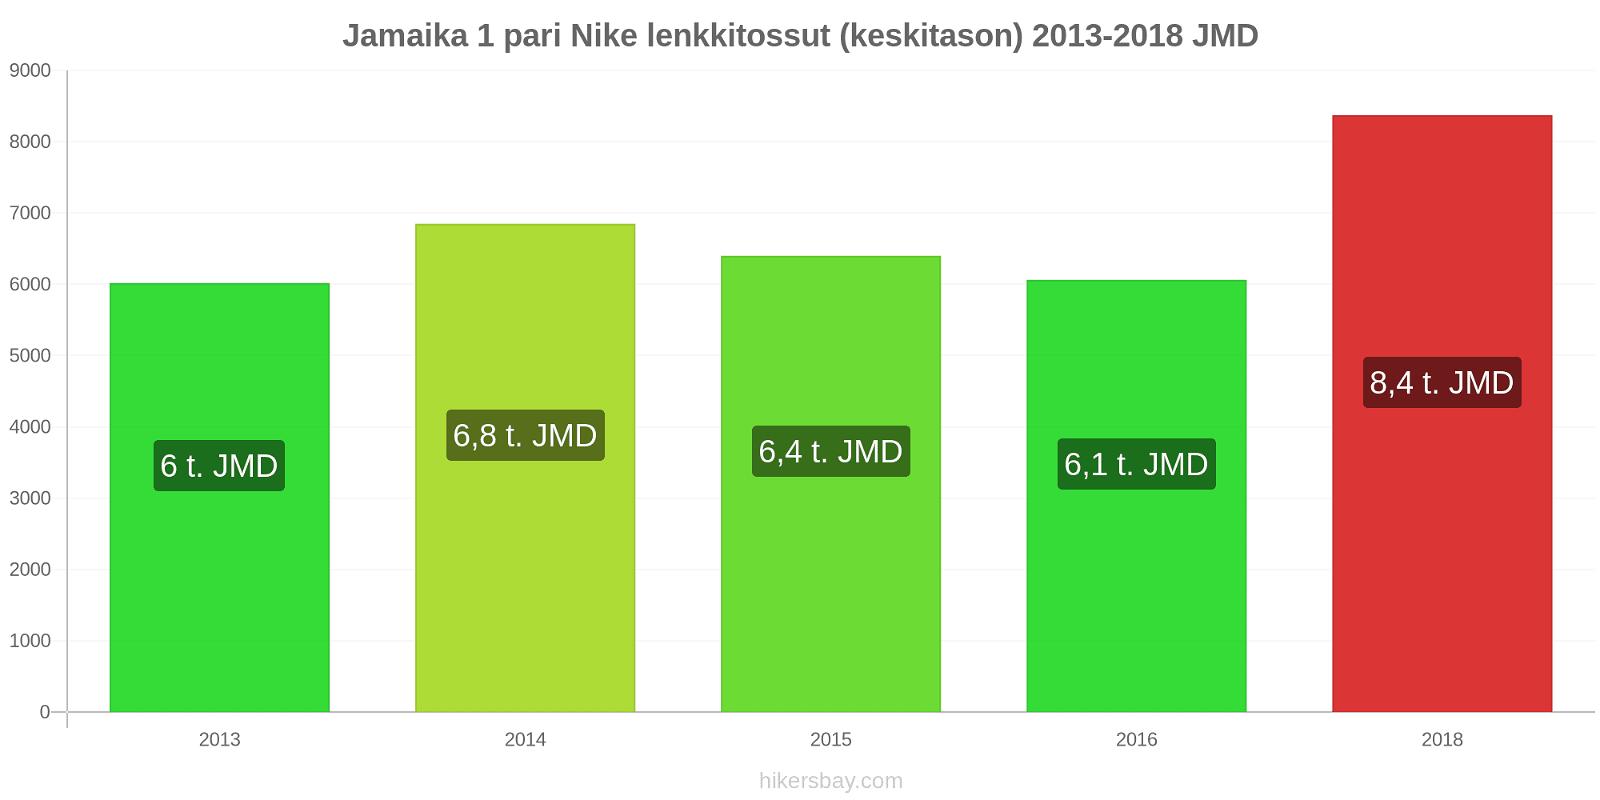 Jamaika hintojen muutokset 1 pari Nike lenkkitossut (keskitason) hikersbay.com